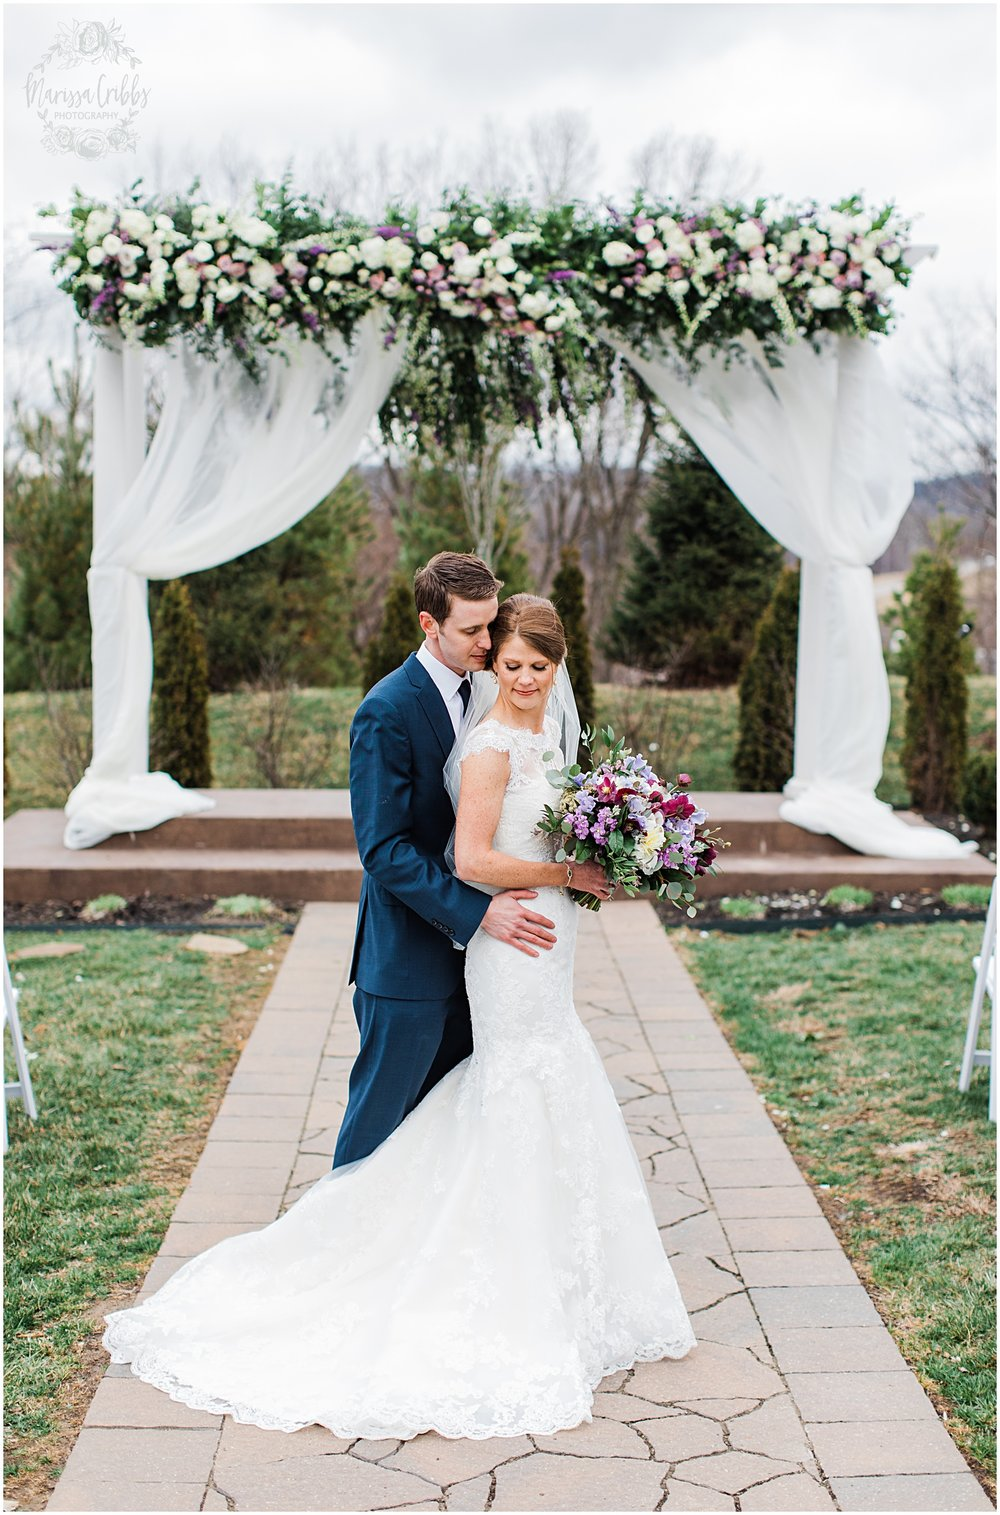 JACOBI WEDDING | 1890 EVENT SPACE | MARISSA CRIBBS PHOTOGRAPHY_4289.jpg